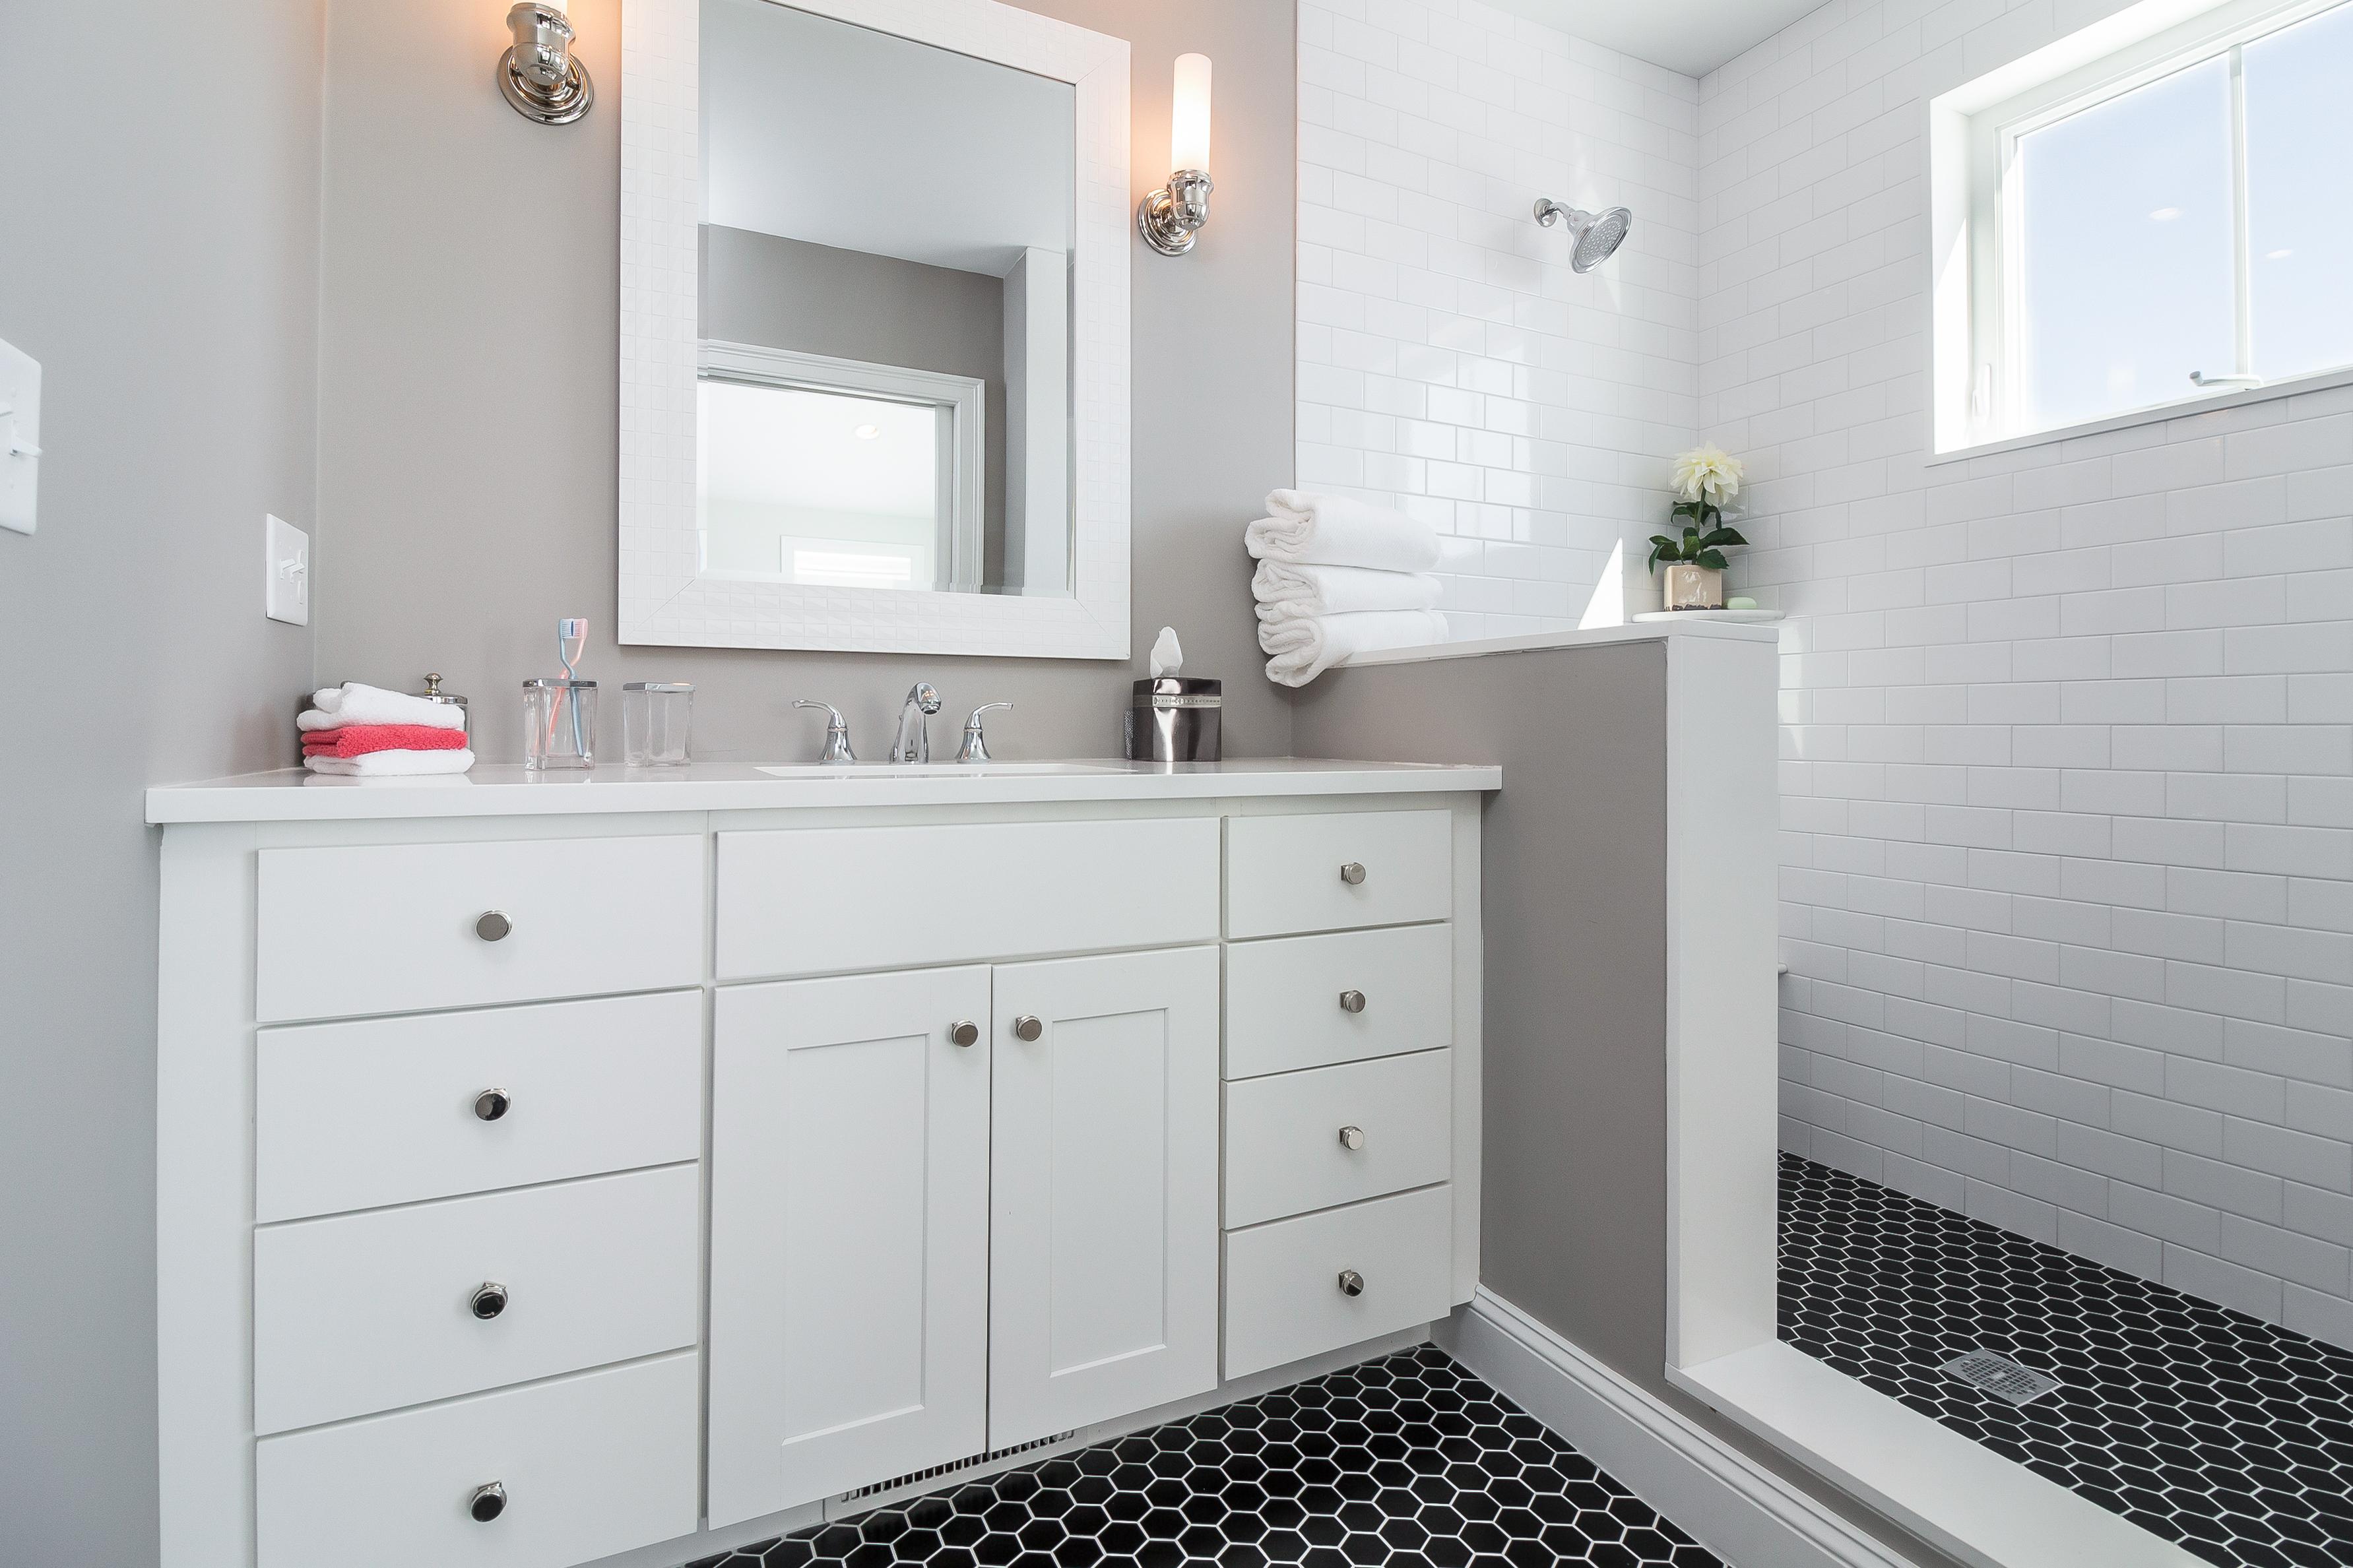 Bathroom suites warwick - 1 Naushon Av 1 Pawtuxet Village Warwick Ri 02888